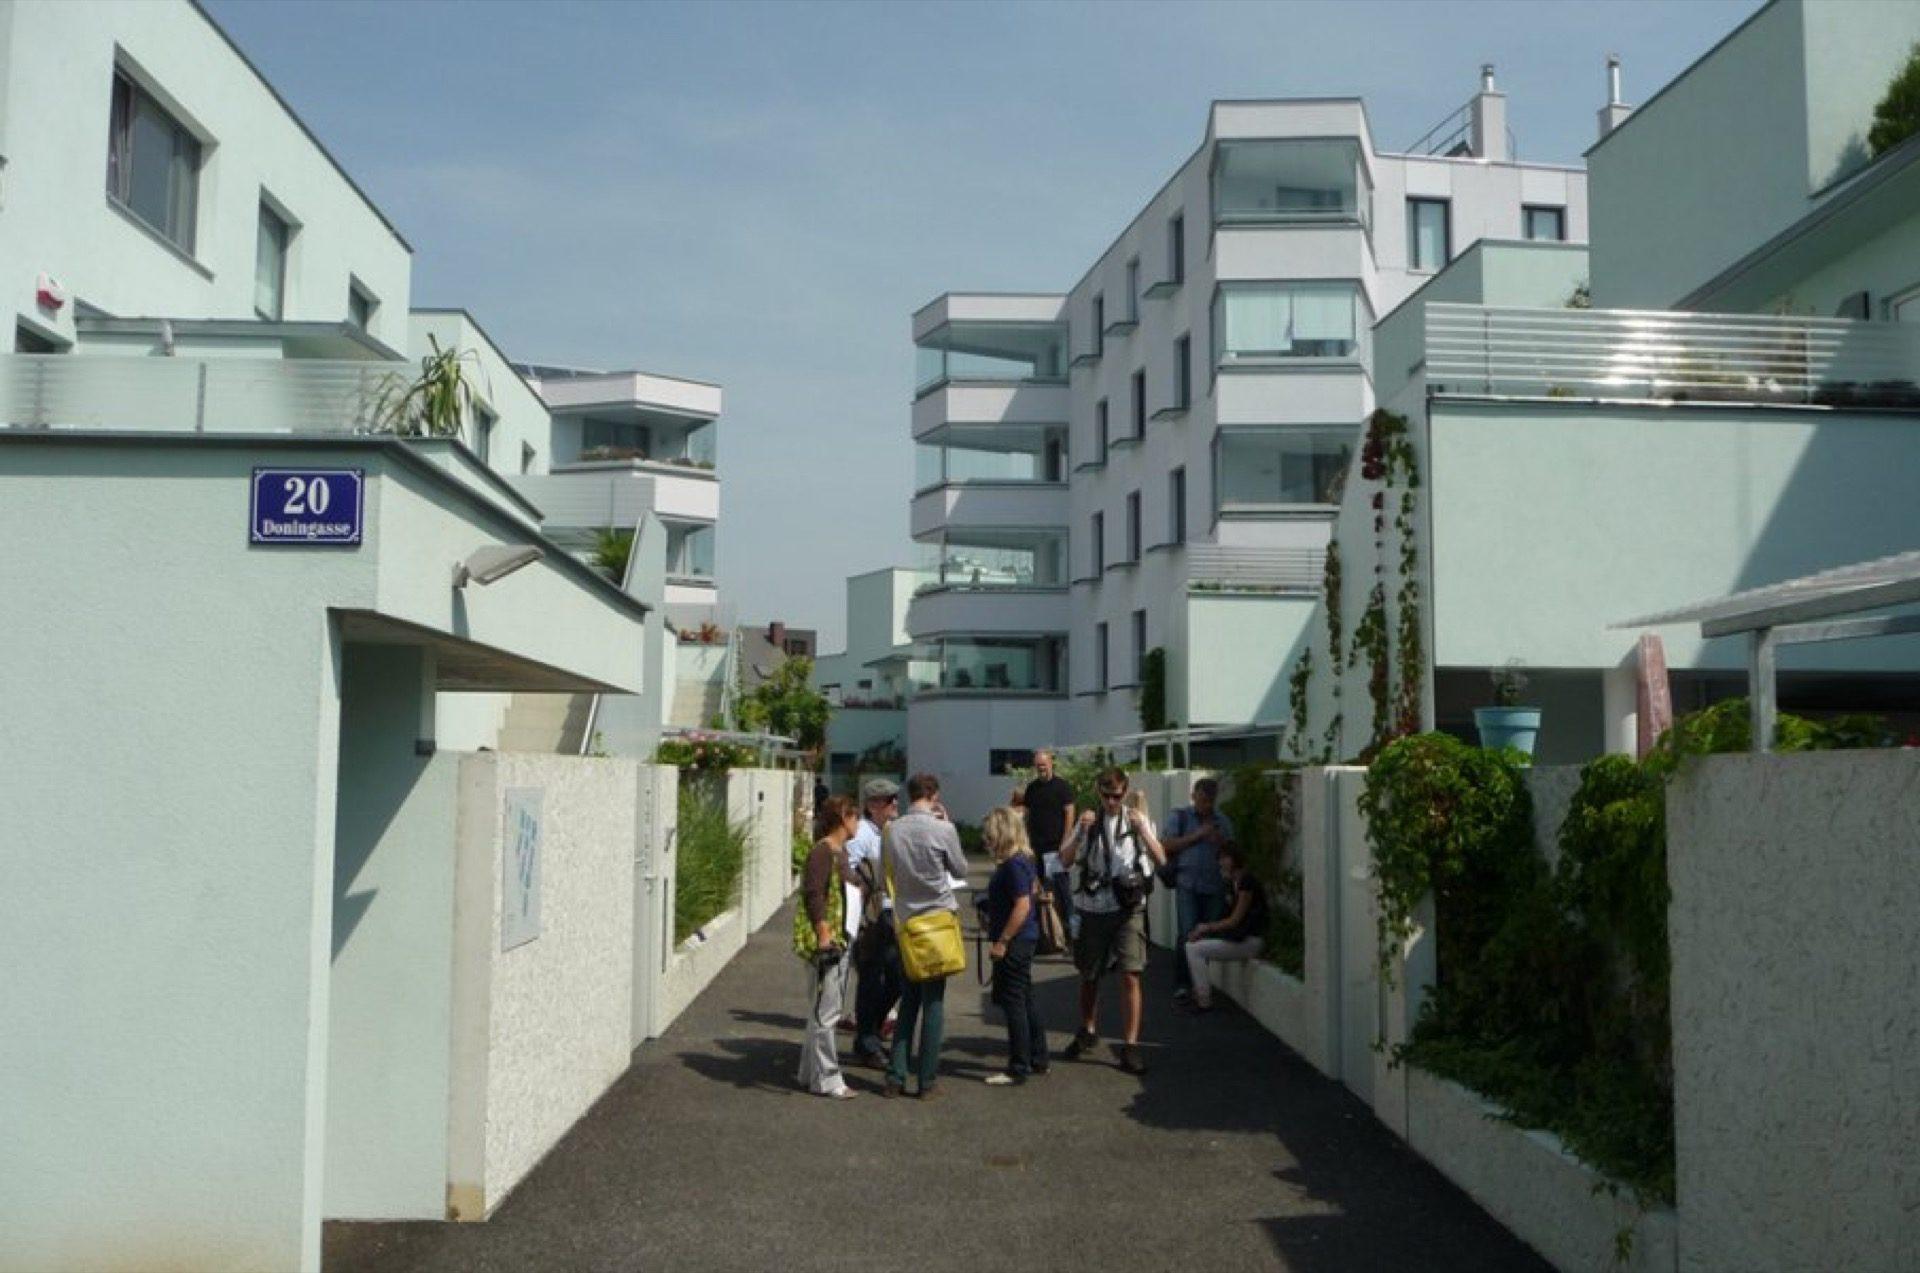 Sozialwohnbau der Gemeinde Wien … jak to dělají sousedé